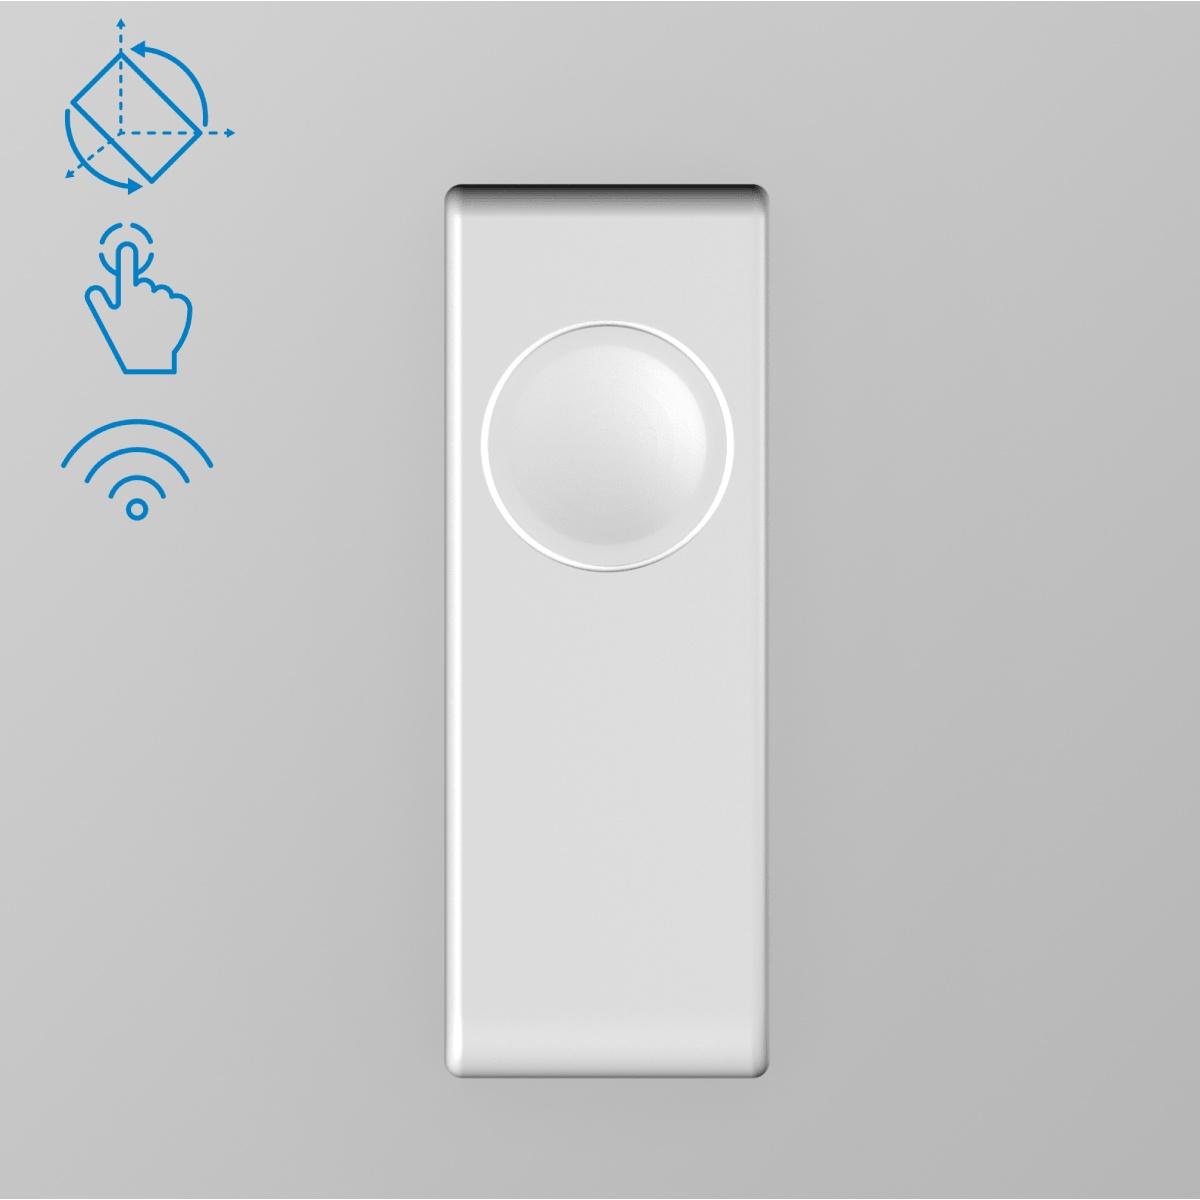 SimplePack 3.0 Plus WiFi tracker